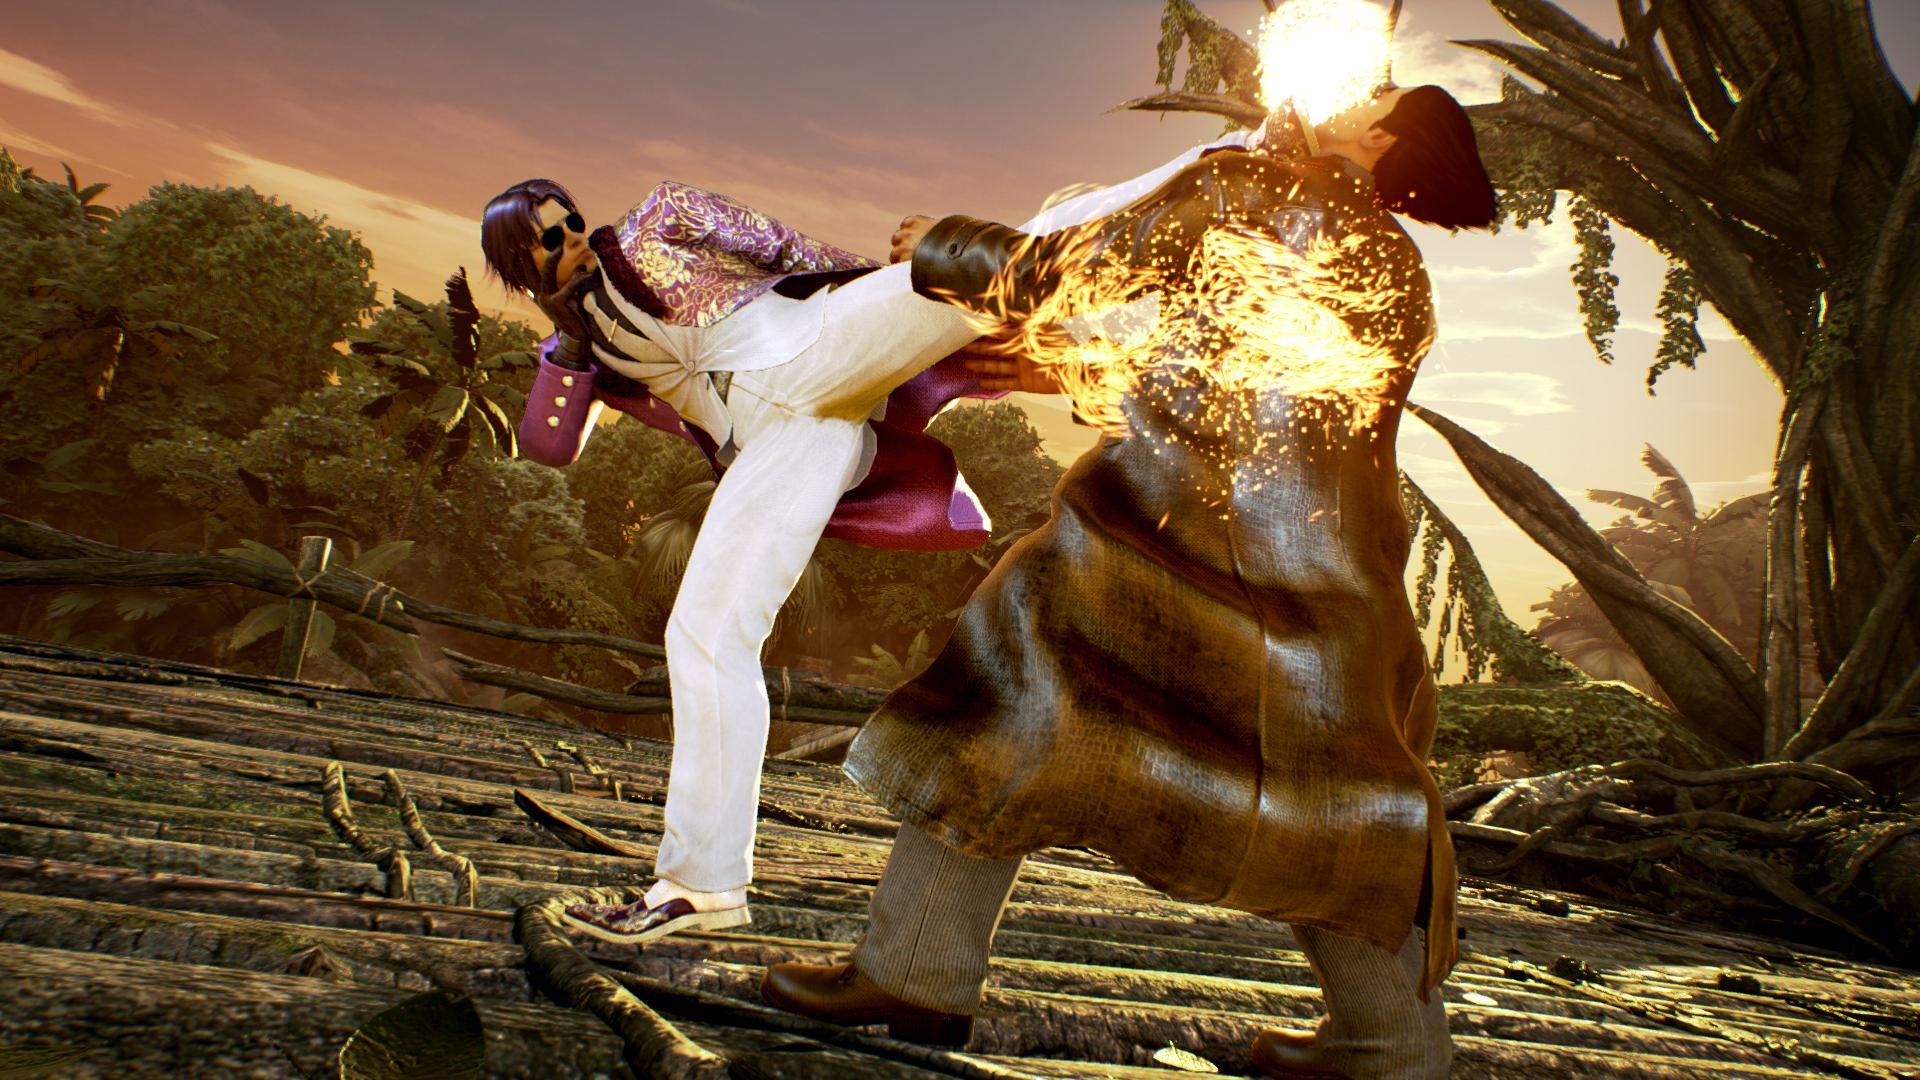 Tekken 7 - Trailer zeig neue Charaktere